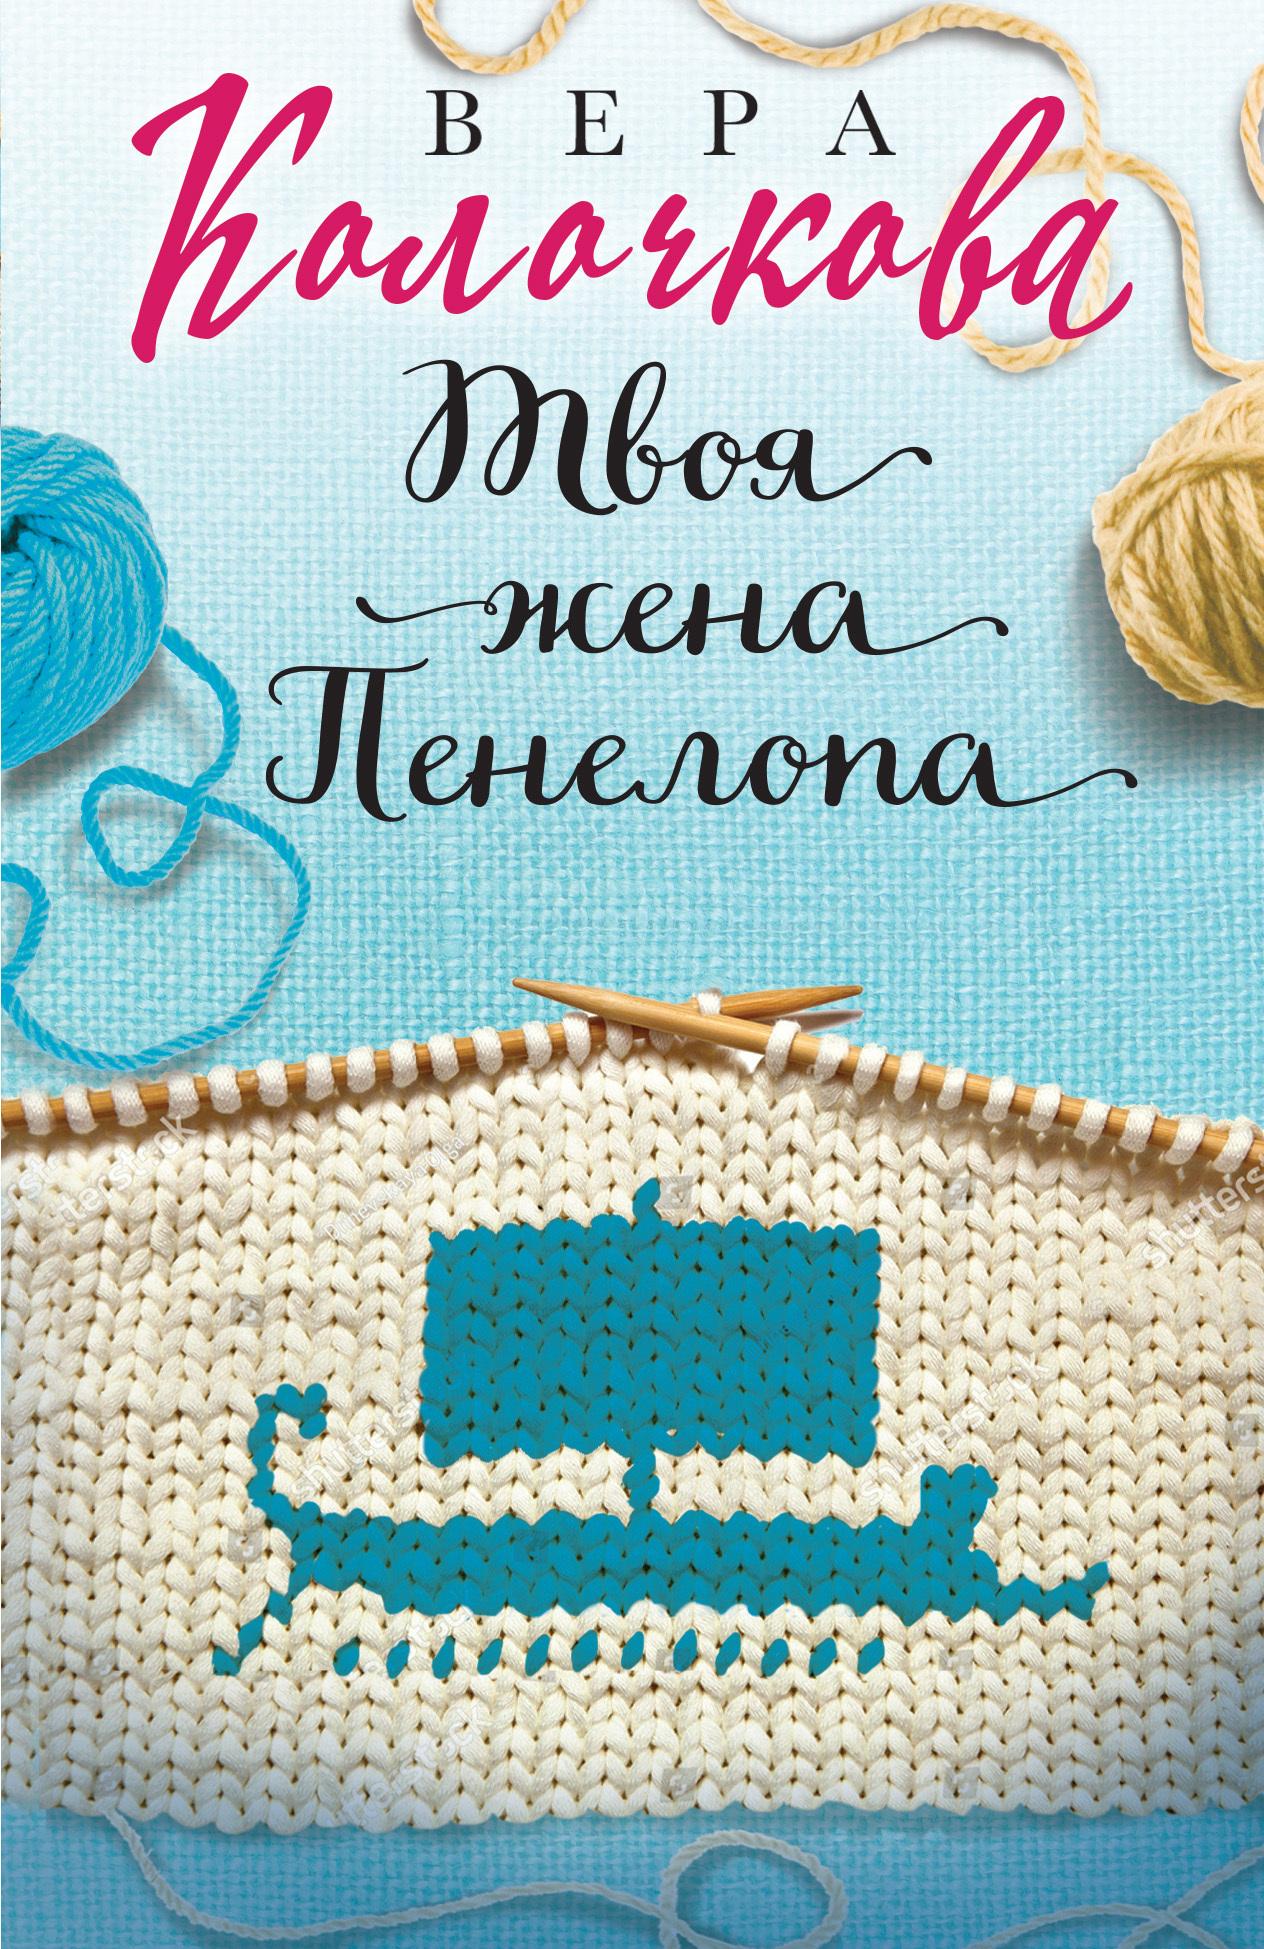 Вера Колочкова Твоя жена Пенелопа вера колочкова твоя жена пенелопа